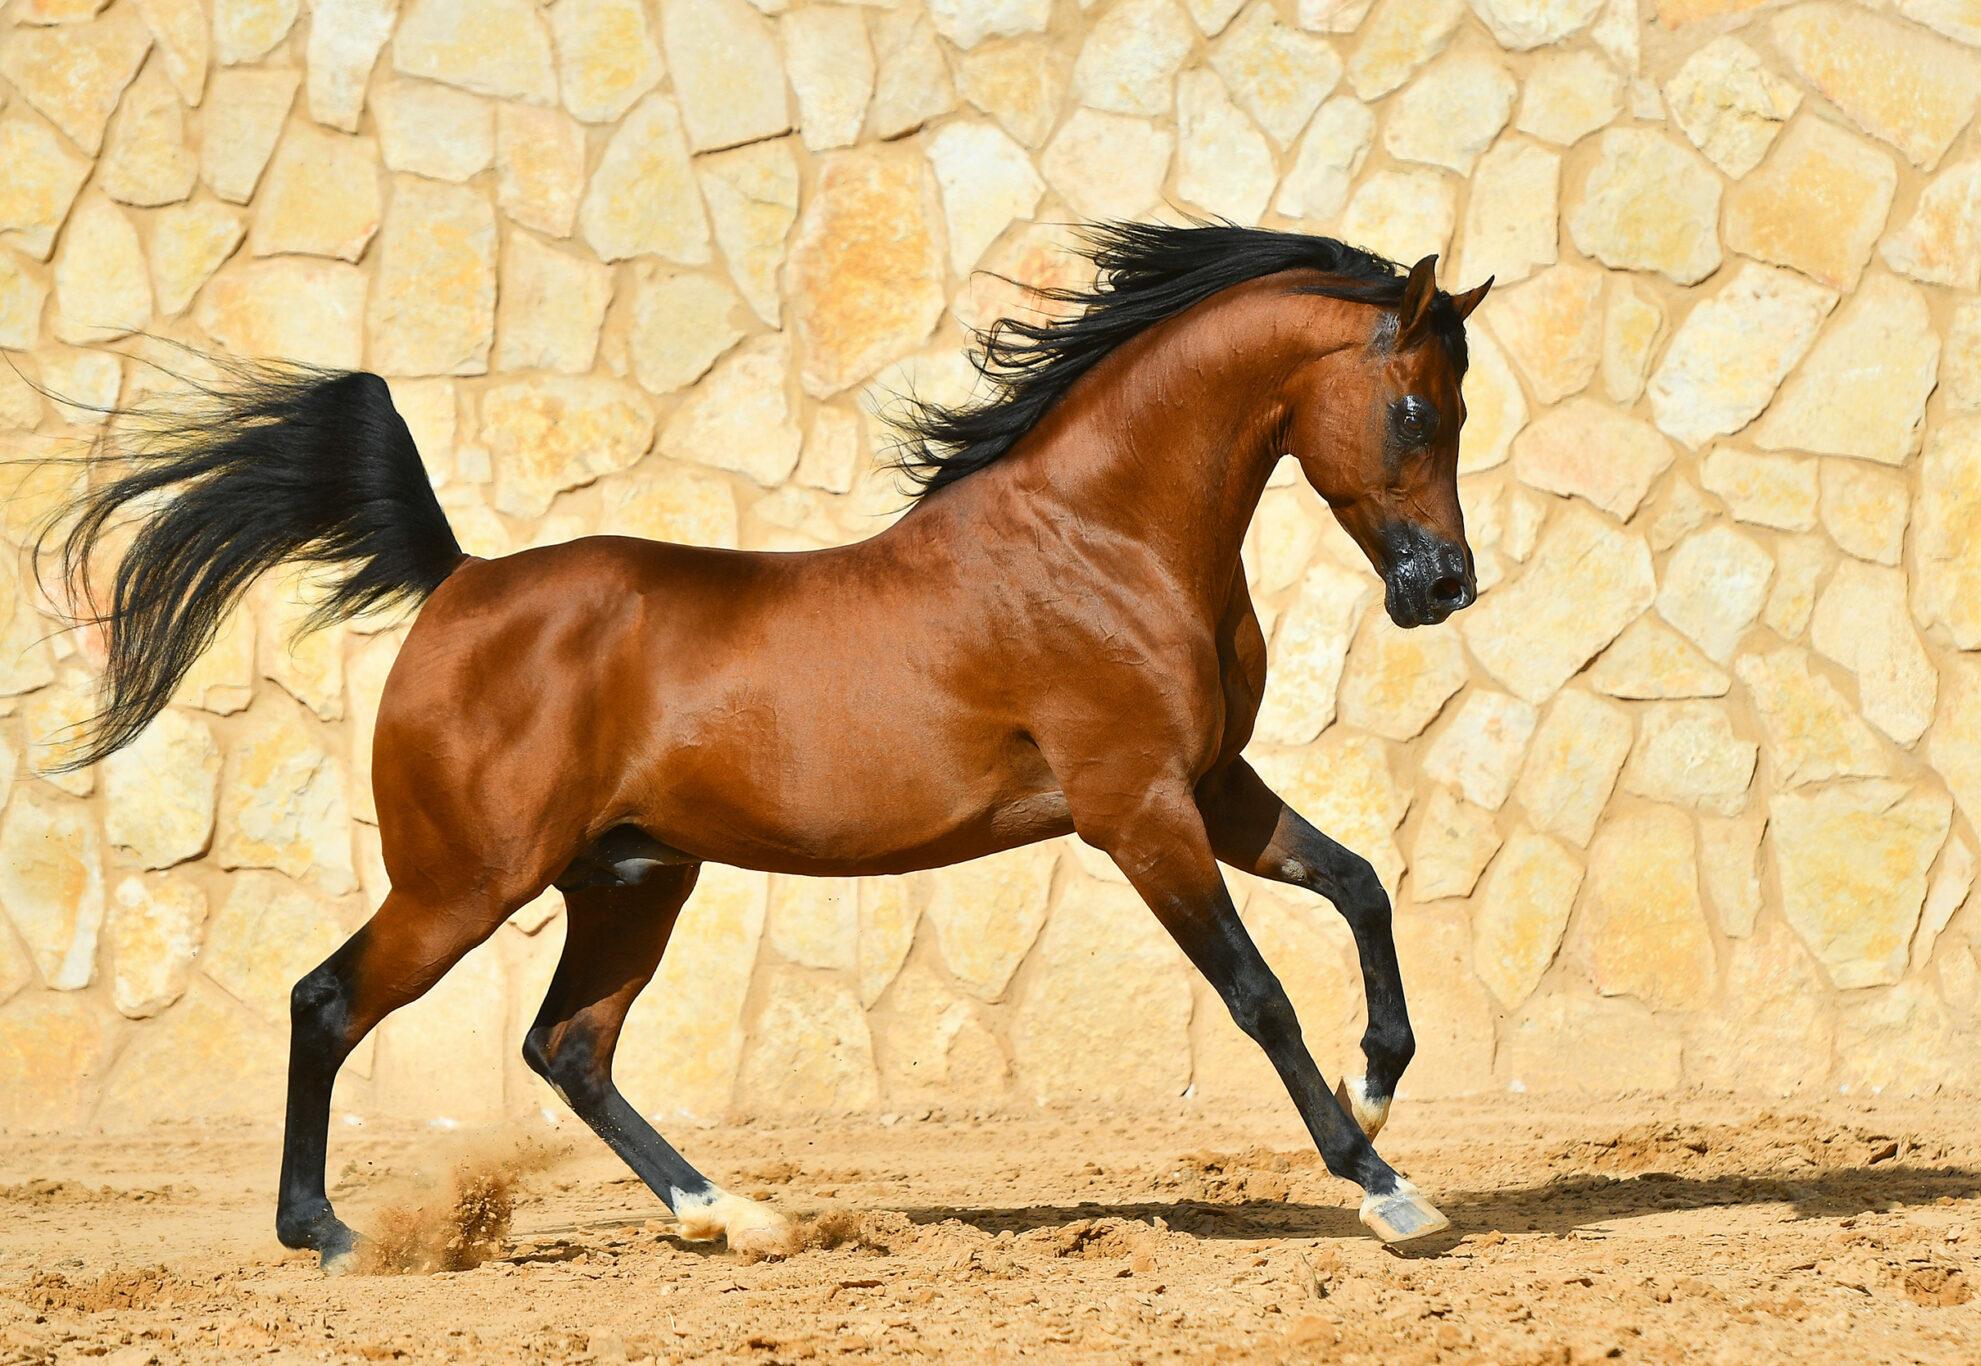 Horse Breed: Arabian - photo via arthorse/Shutterstock.com - Globetrotting horse riding holidays